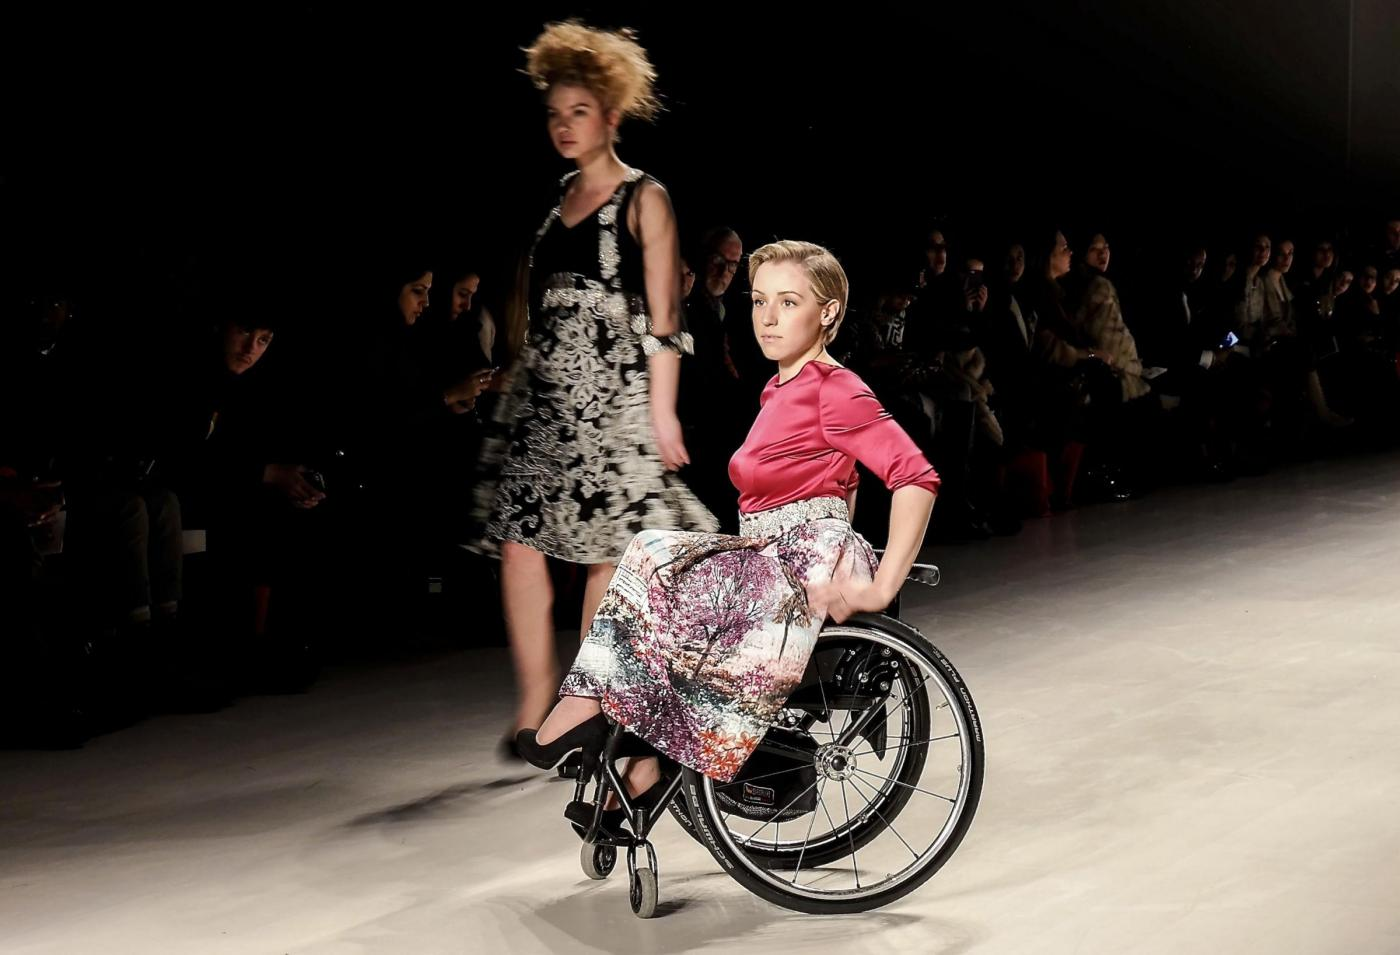 modelle in sedie a rotelle alla new york fashion week foto